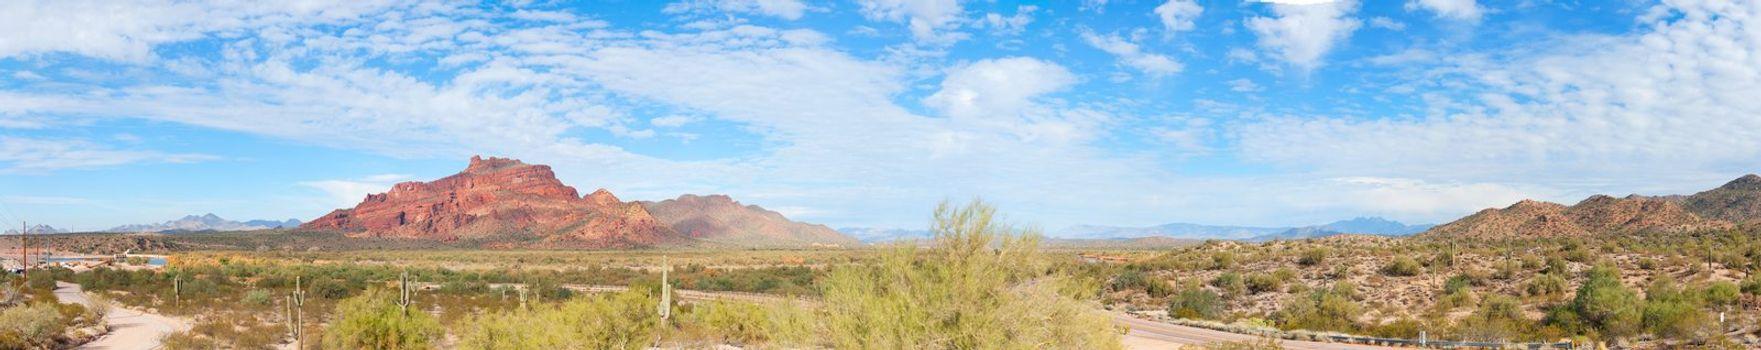 Panorama of Red Mountain in Arizona